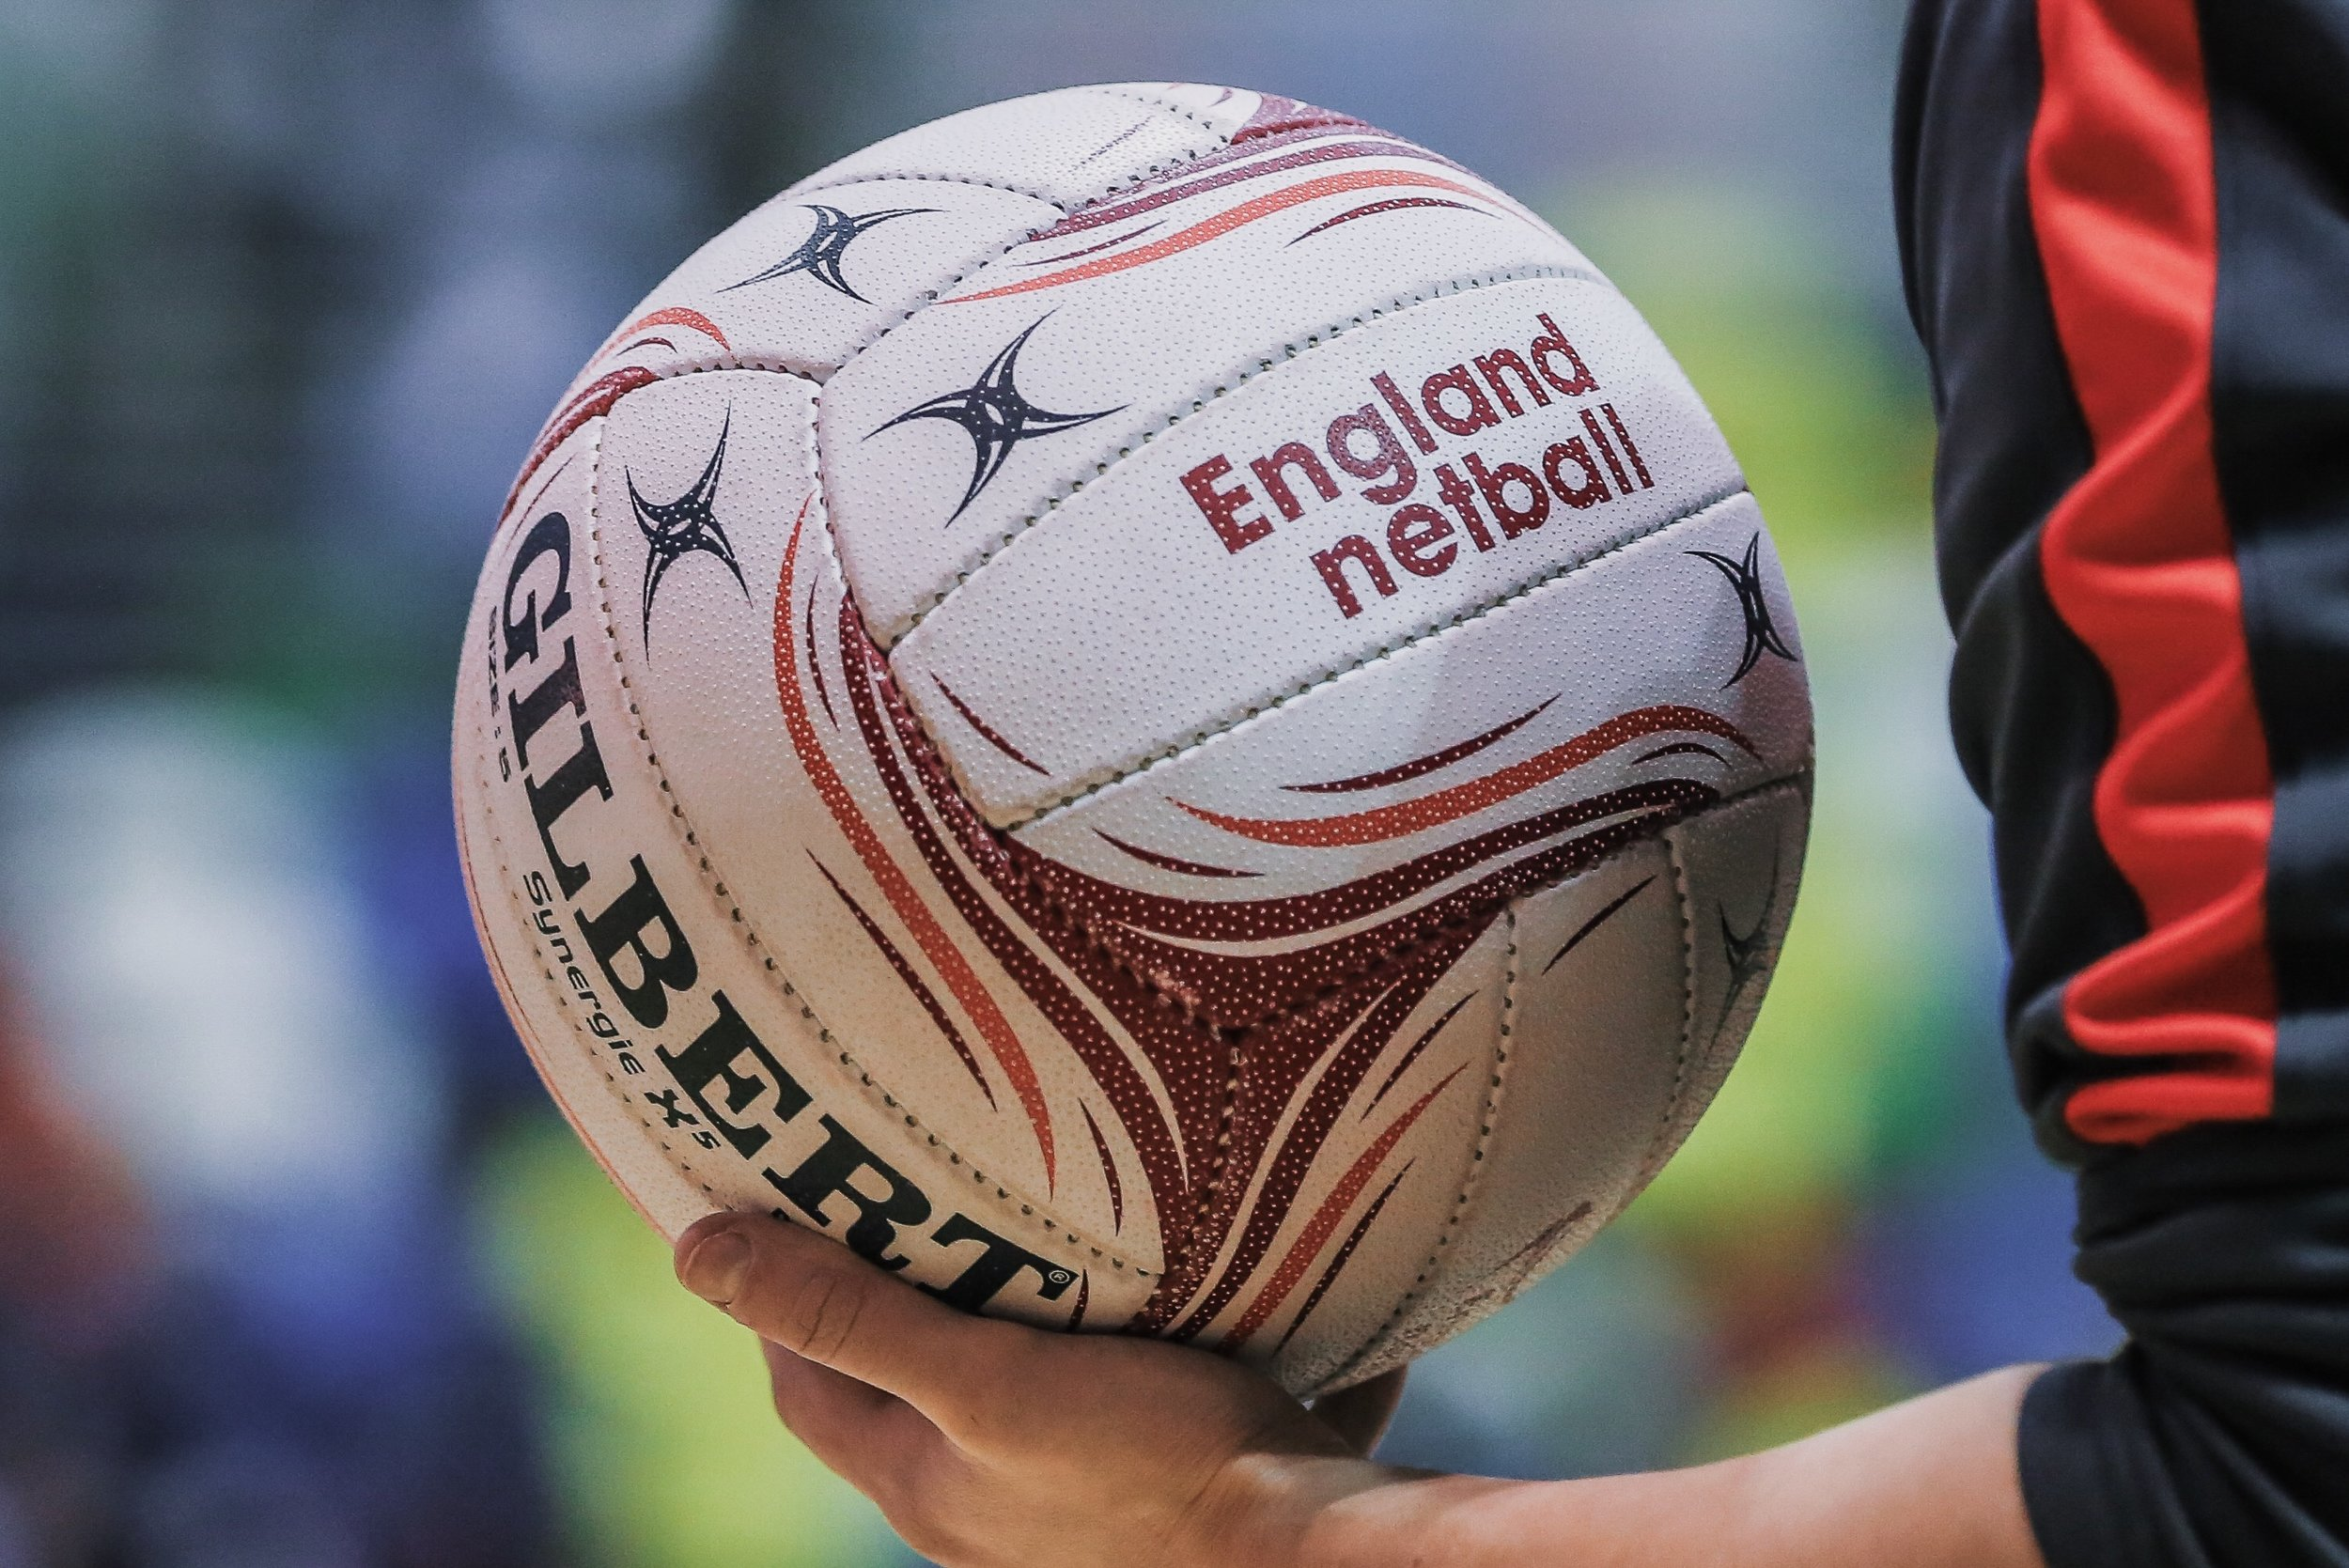 womens-netball-sport-england-uganda-international-series-32.jpg